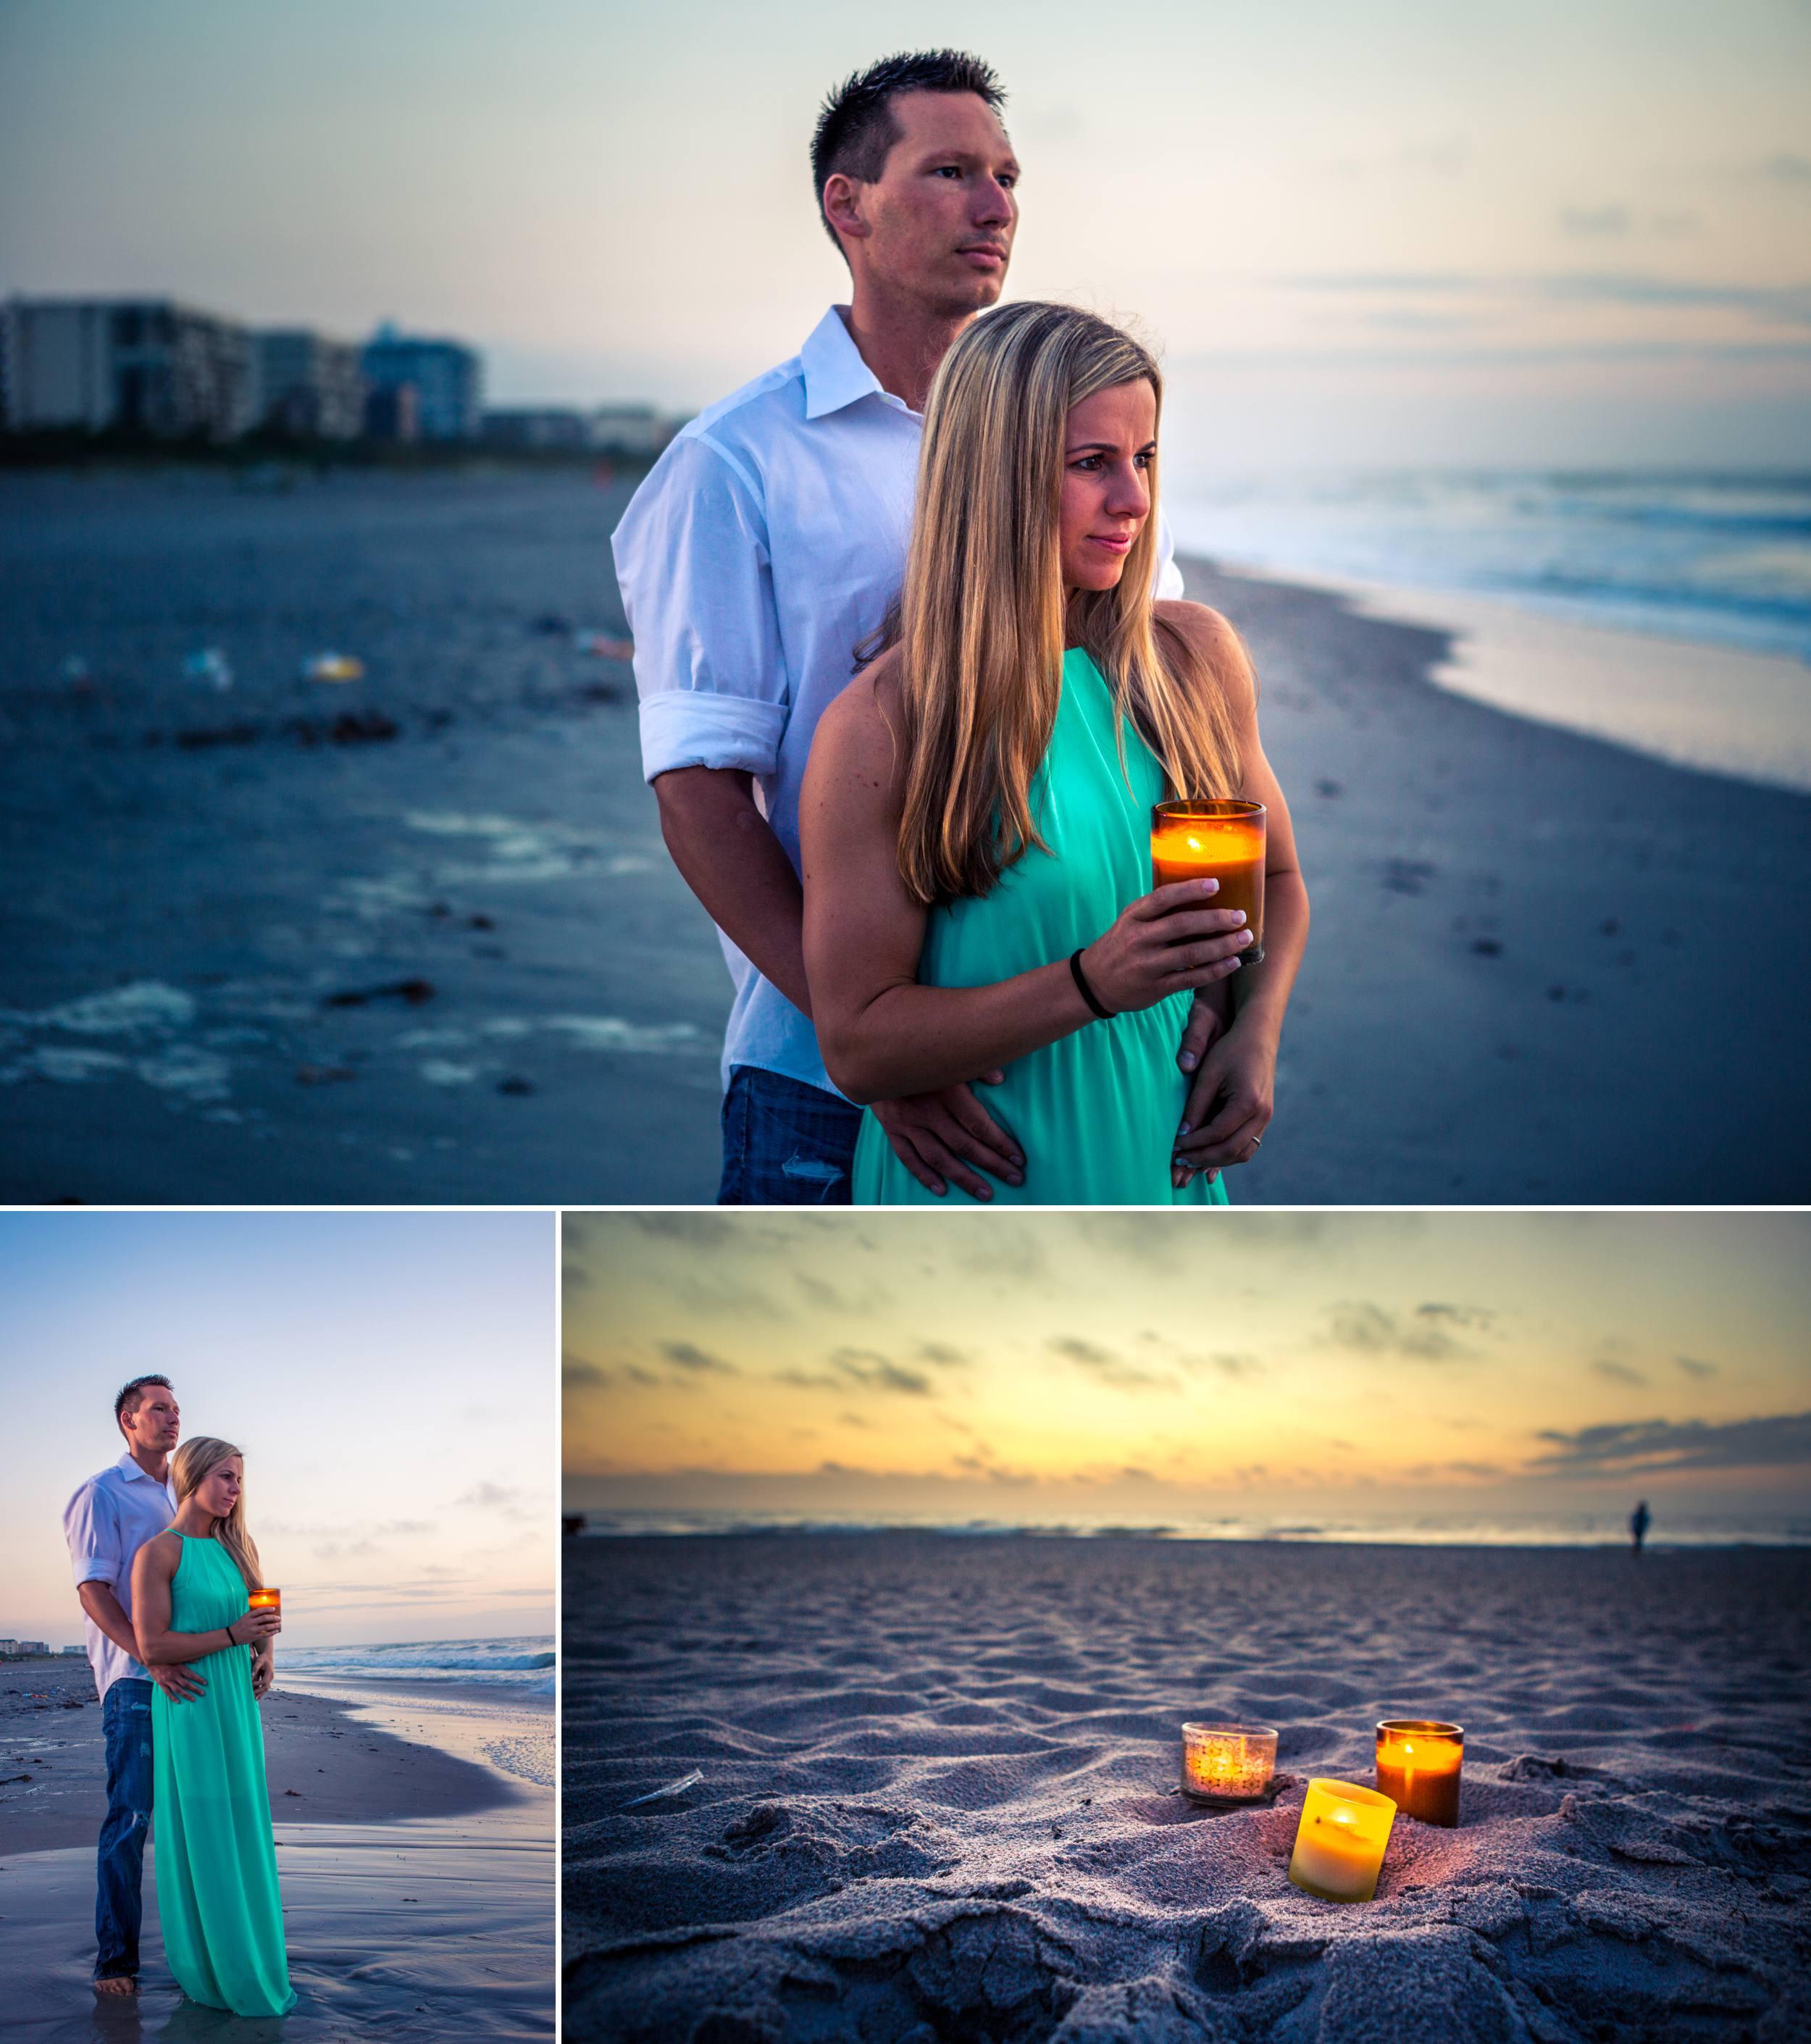 Lori Wilson Park Cocoa Beach Sunrise Engagement Session Mint Green dress- Bri 1.jpg